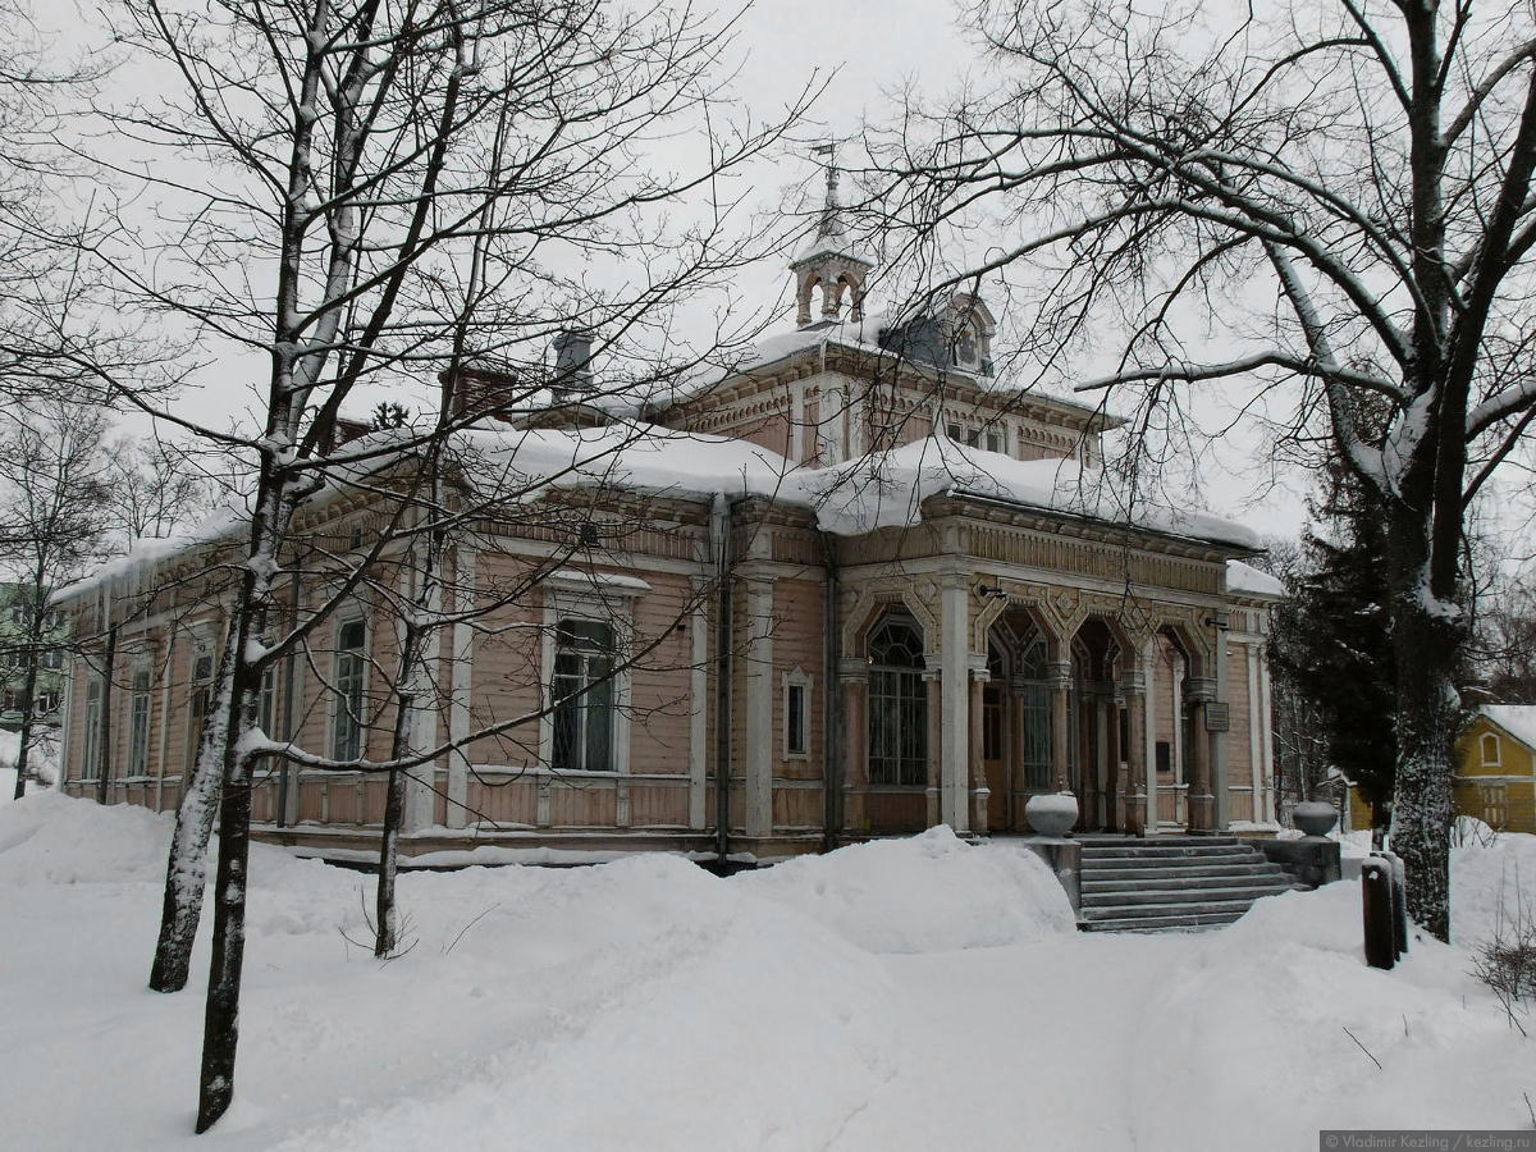 Via Karelia. Cортавала зимой